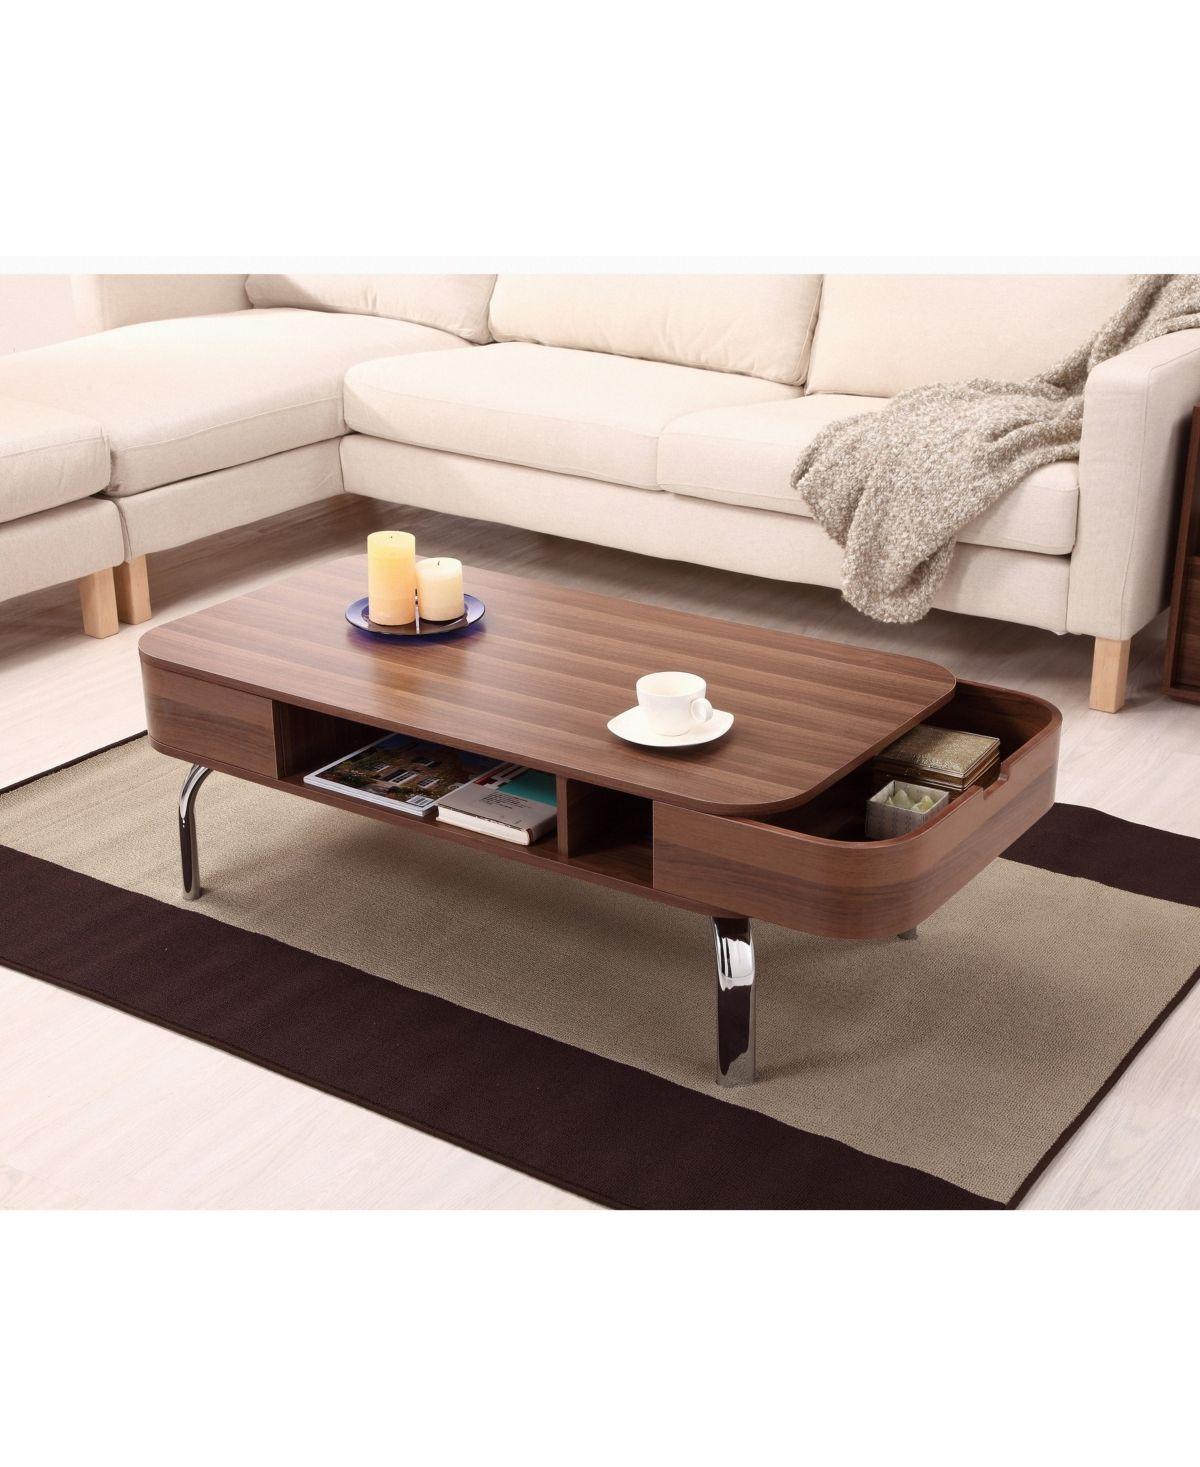 19++ Walnut coffee table with storage trends